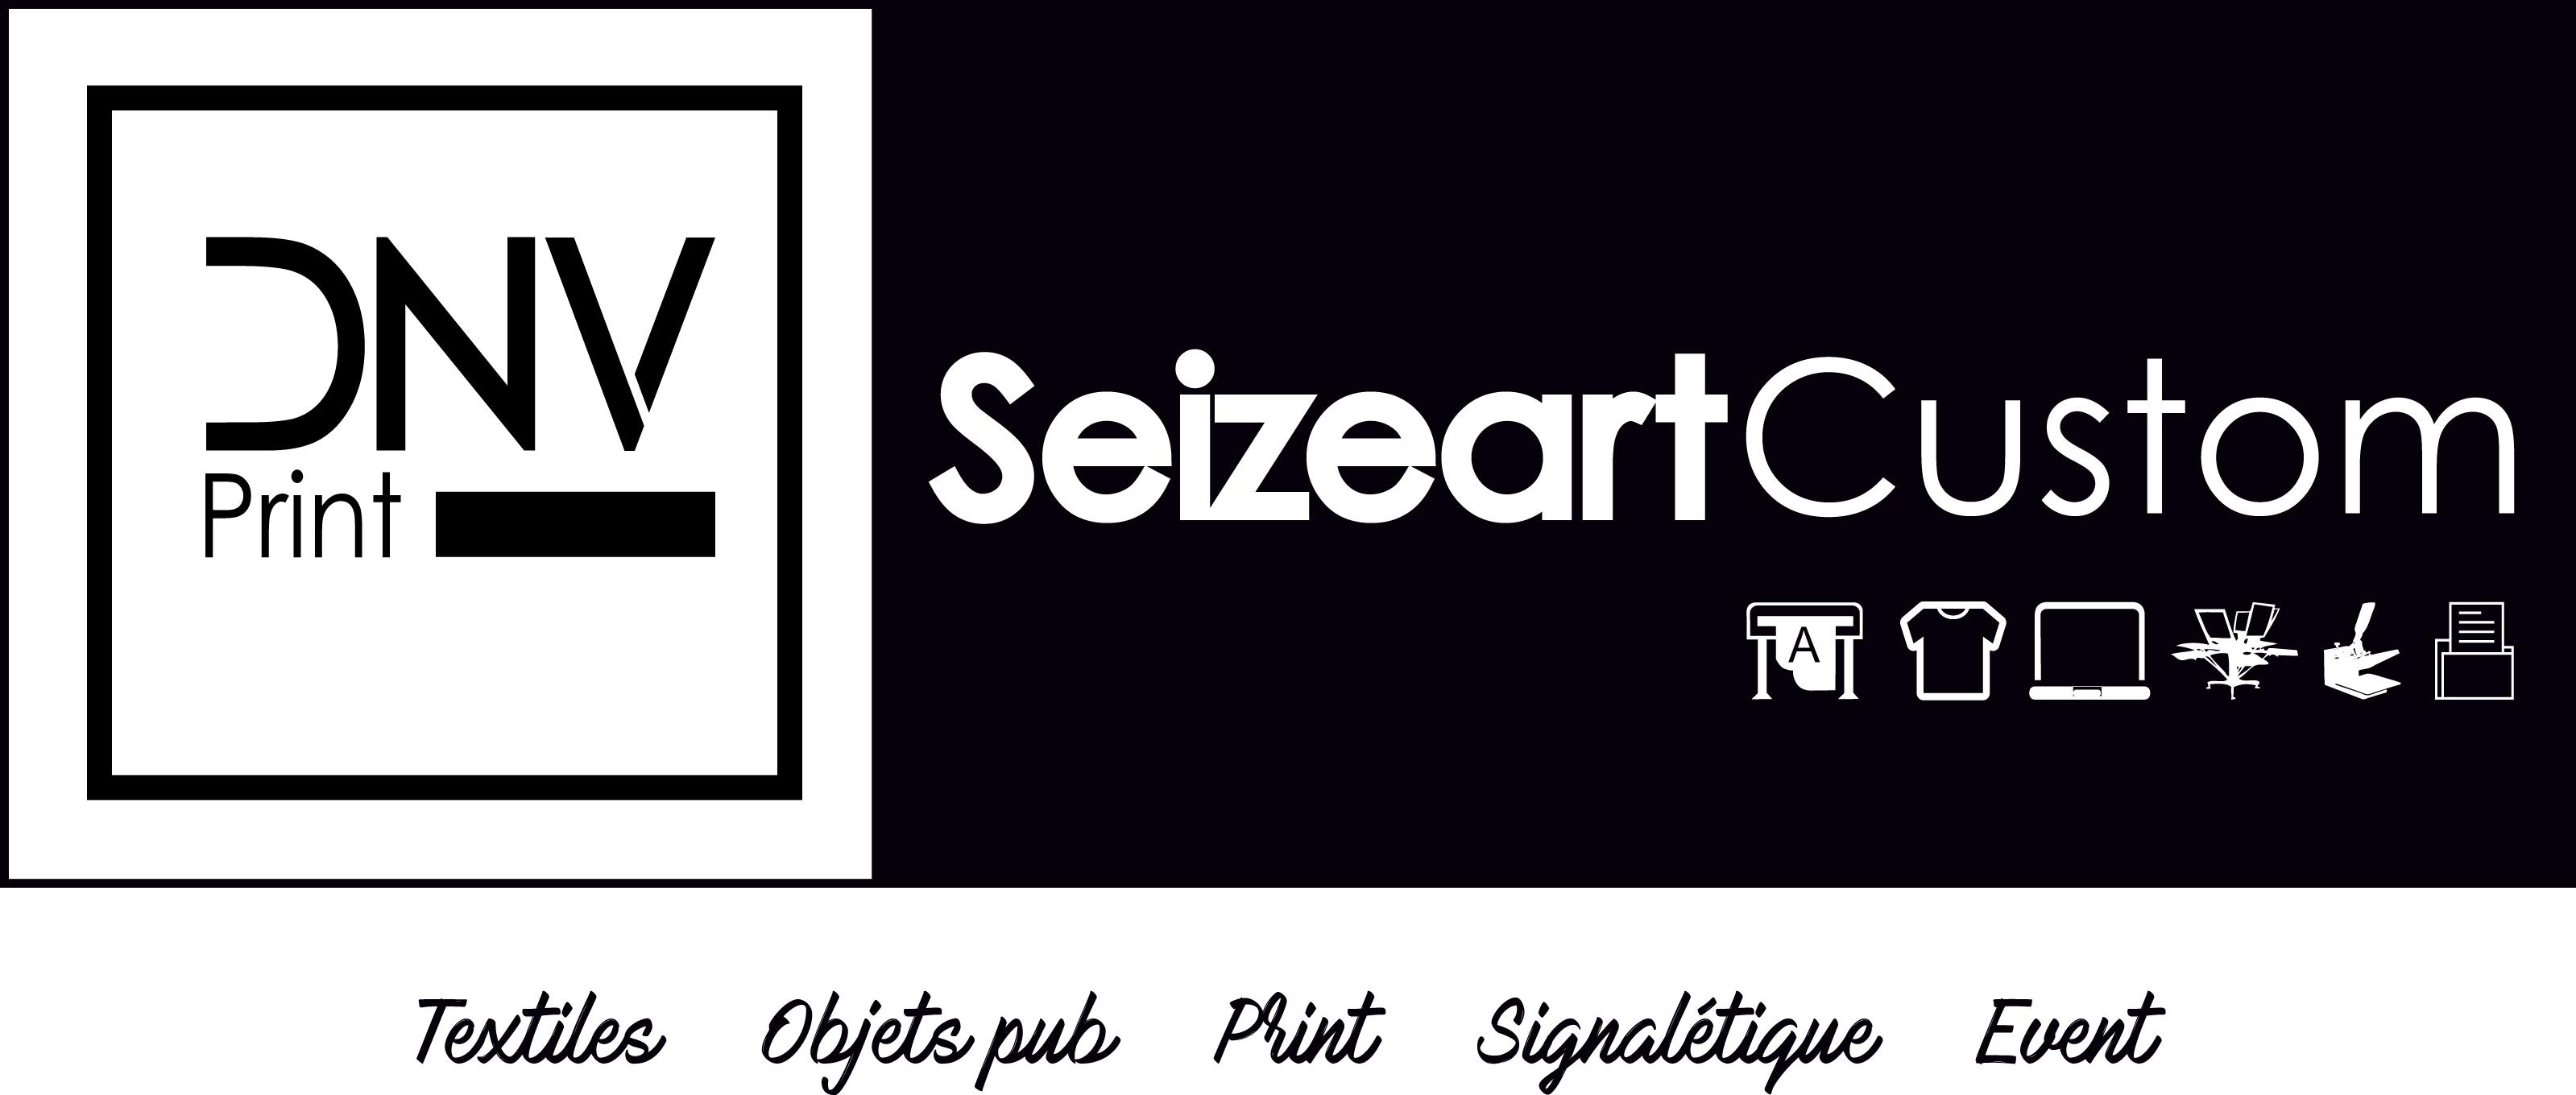 DNV Print - Seizeart Custom